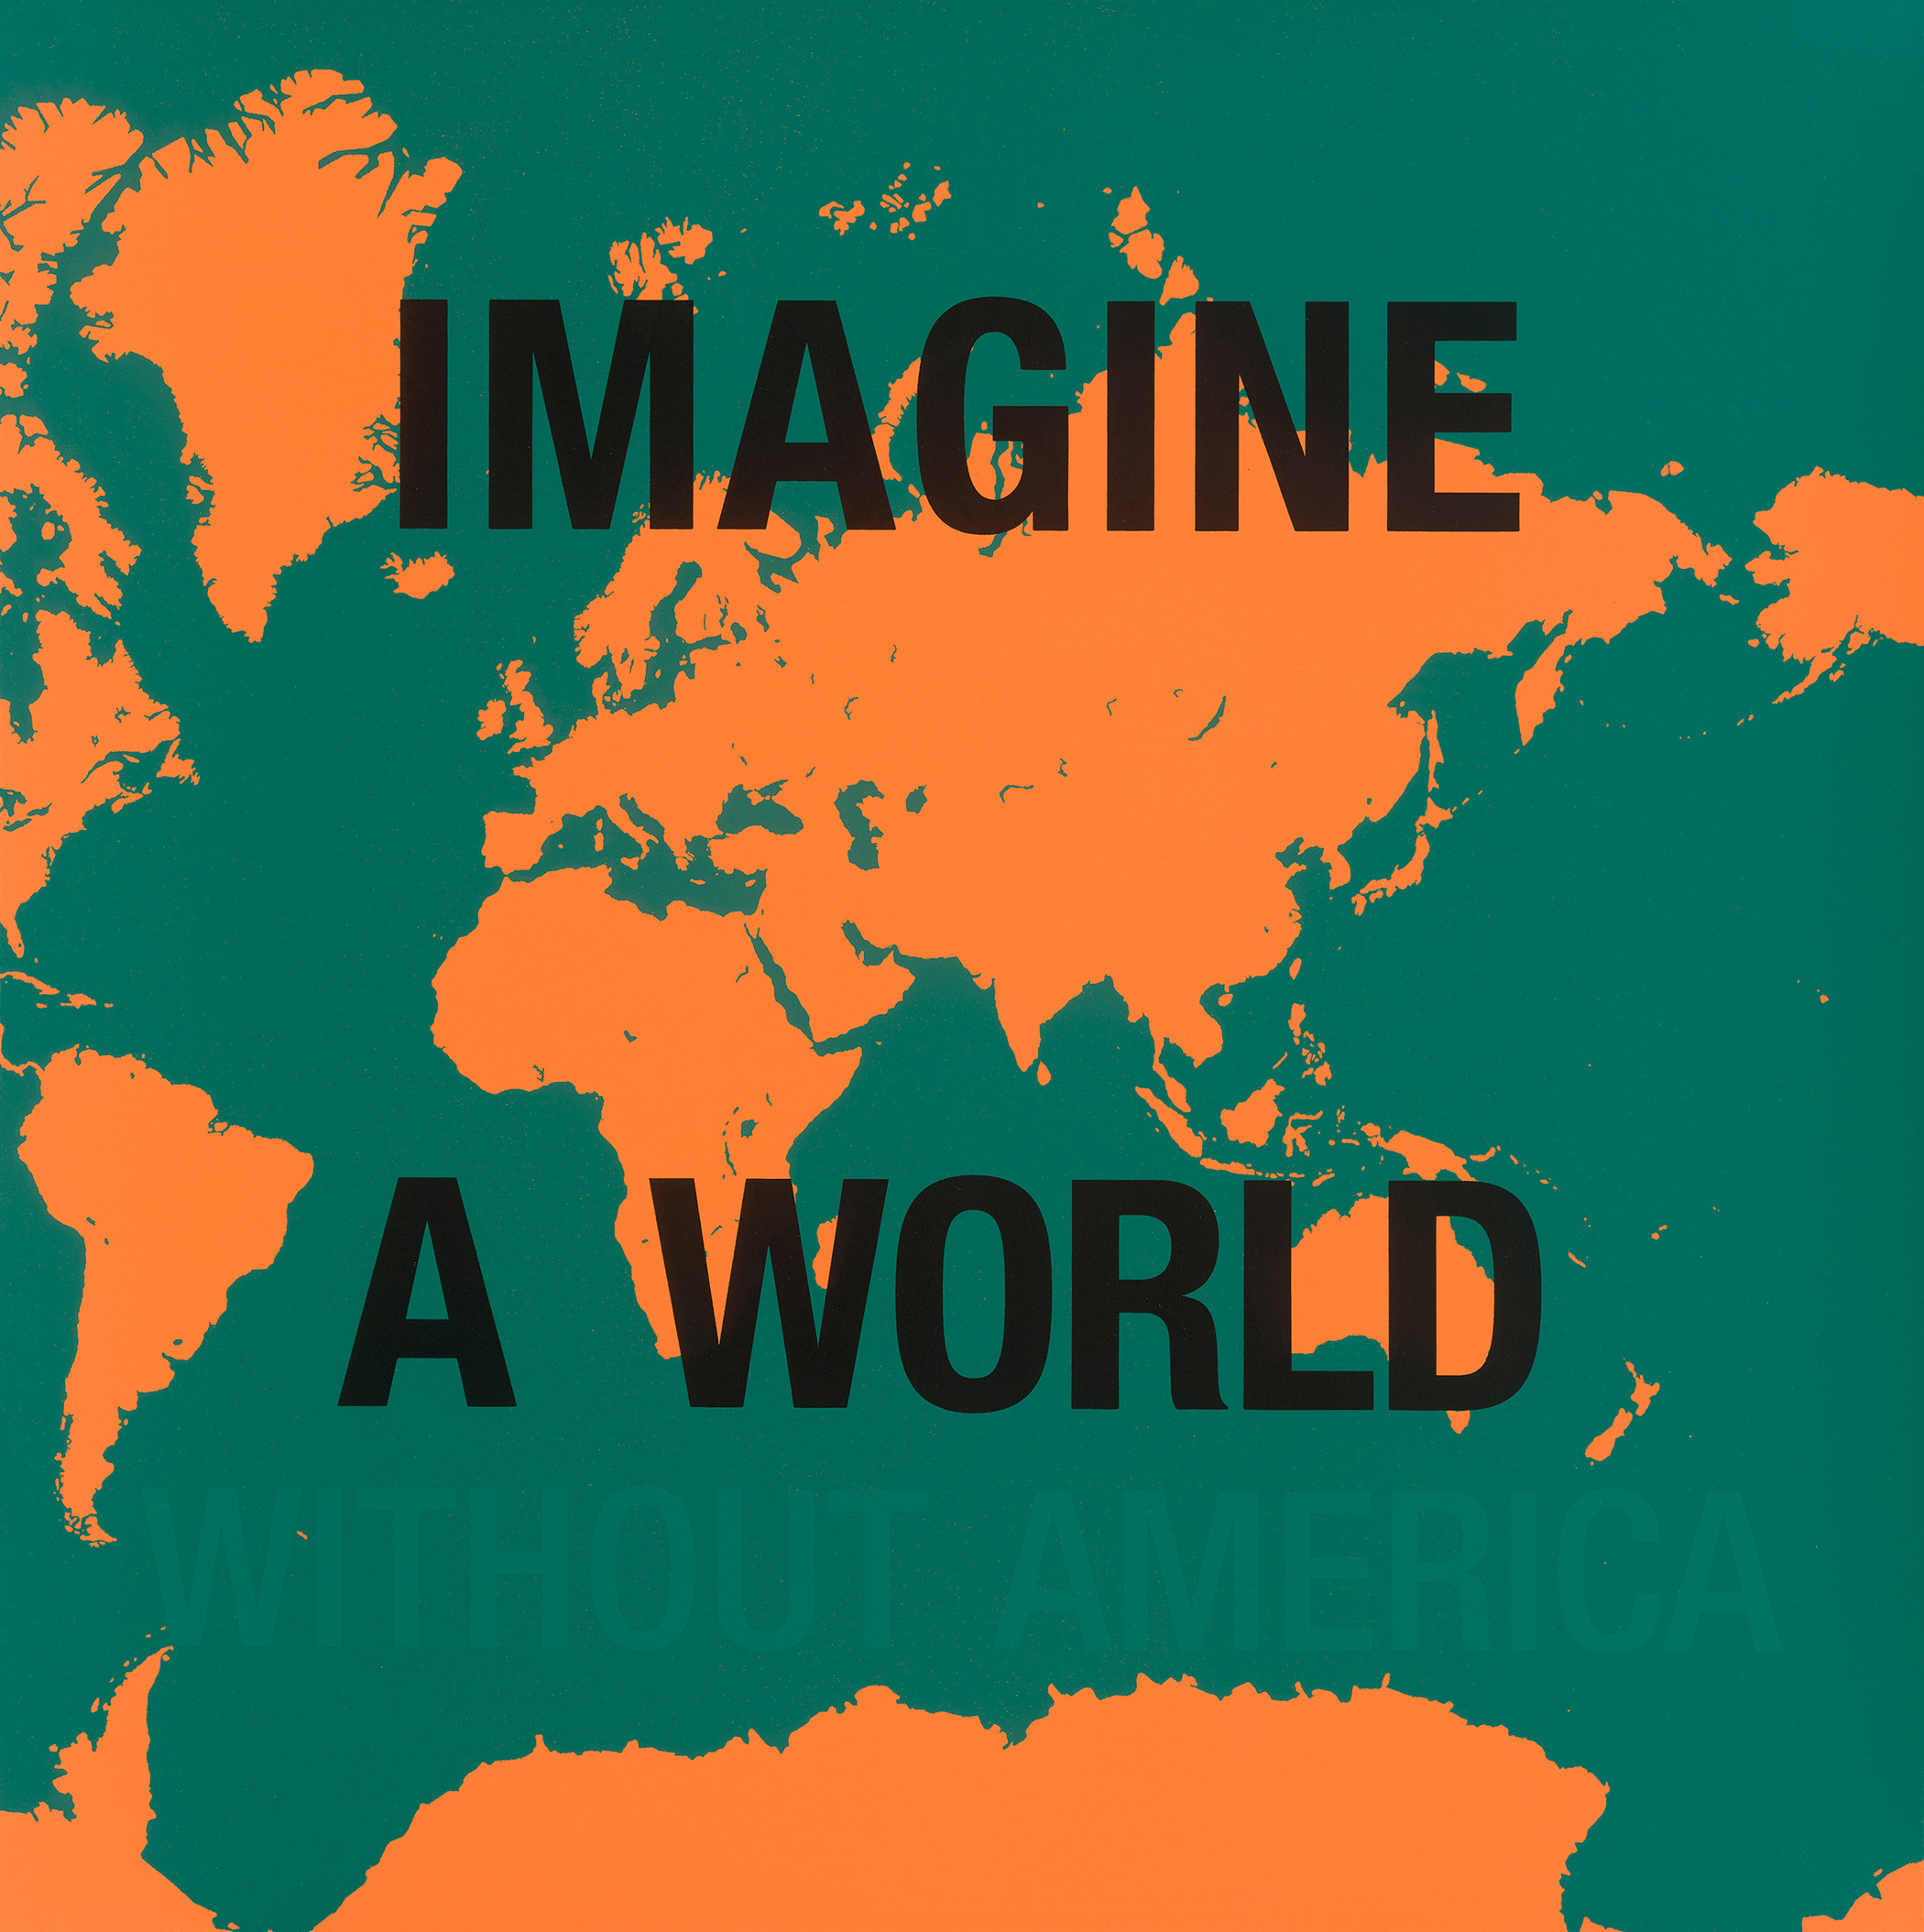 Imagine-scan-from-print-7x7-300dpi1.jpg